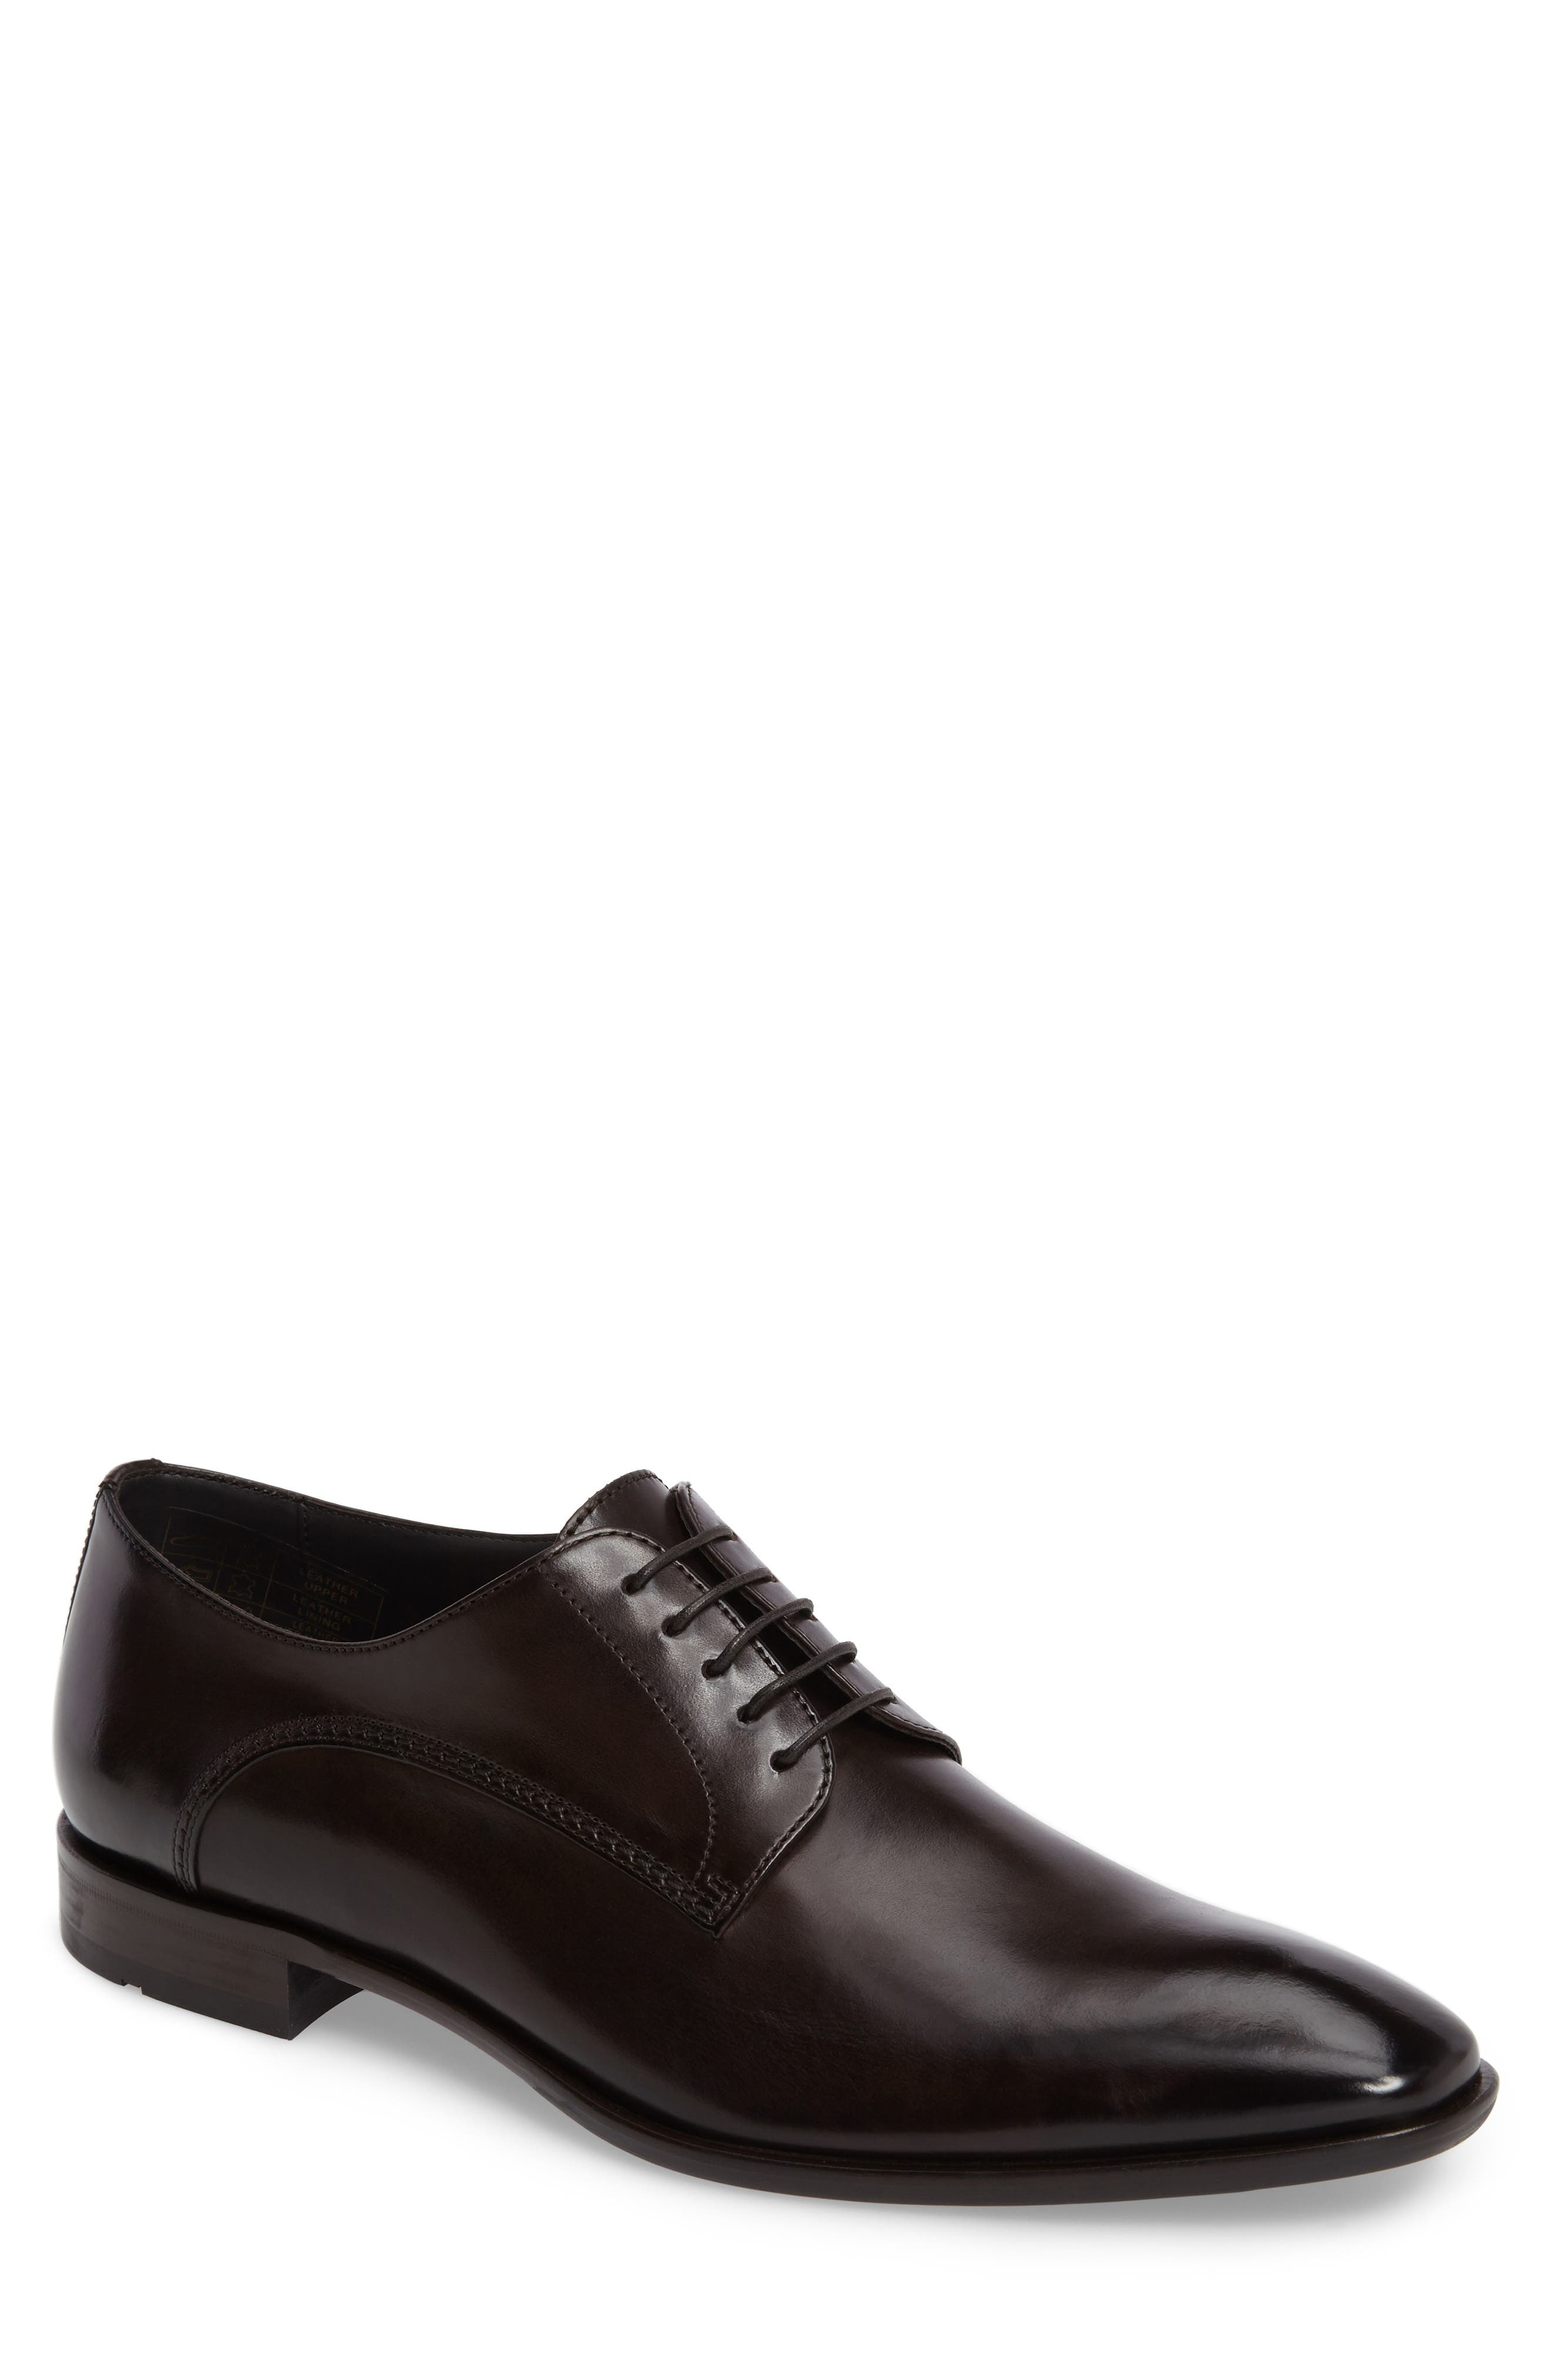 Carmons Plain Toe Derby,                         Main,                         color, Dark Brown Leather